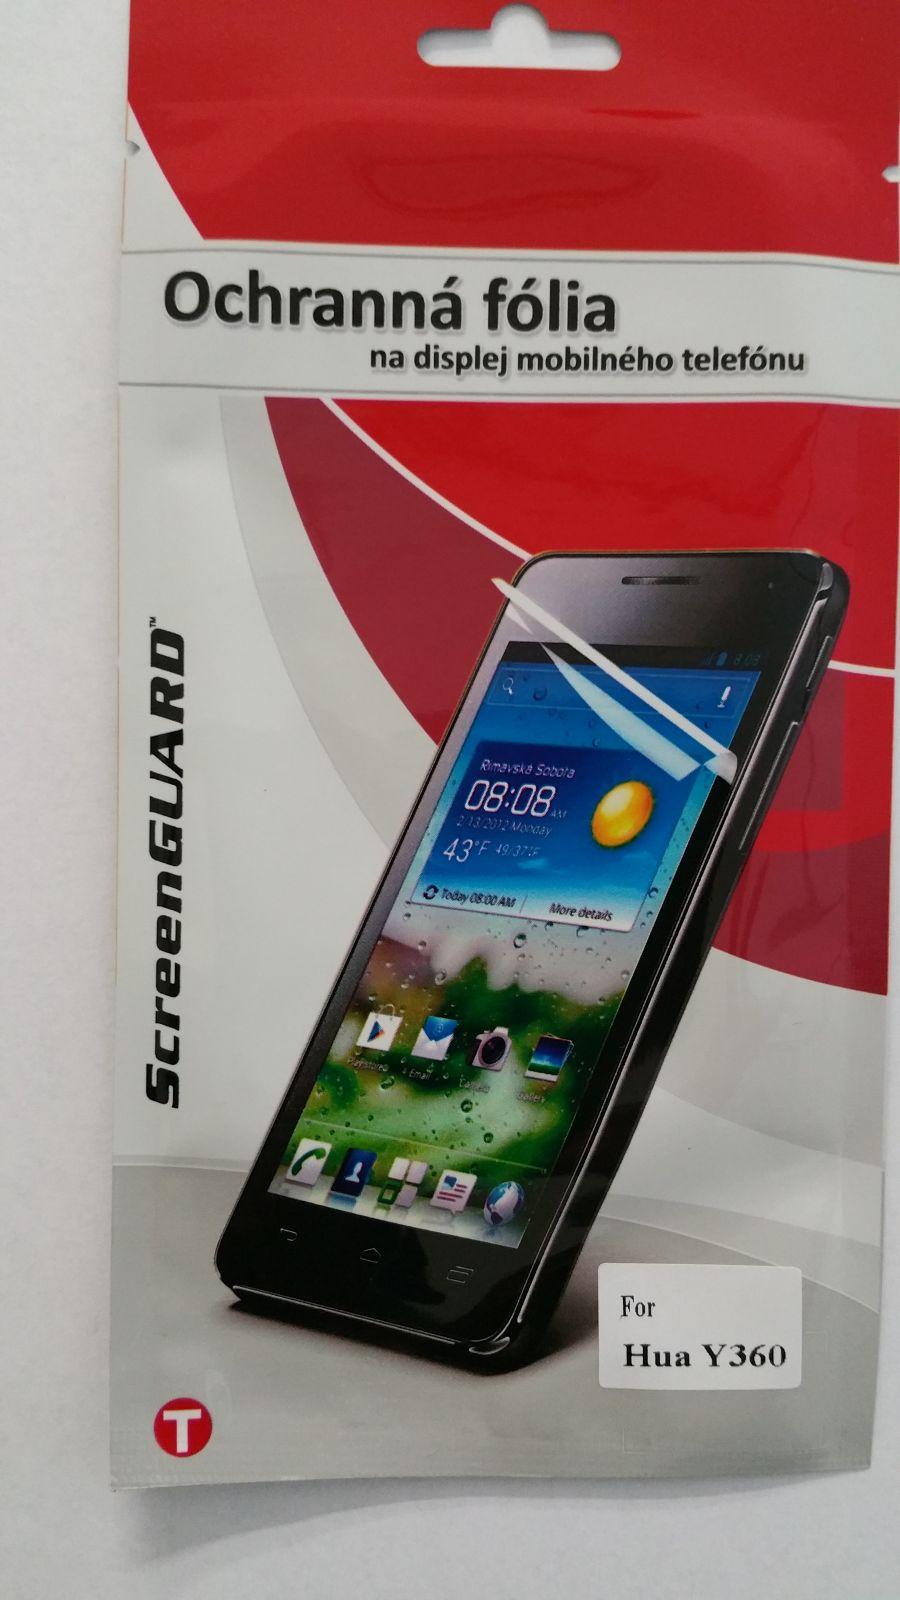 Ochranná folie Mobilnet Huawei Ascend Y360